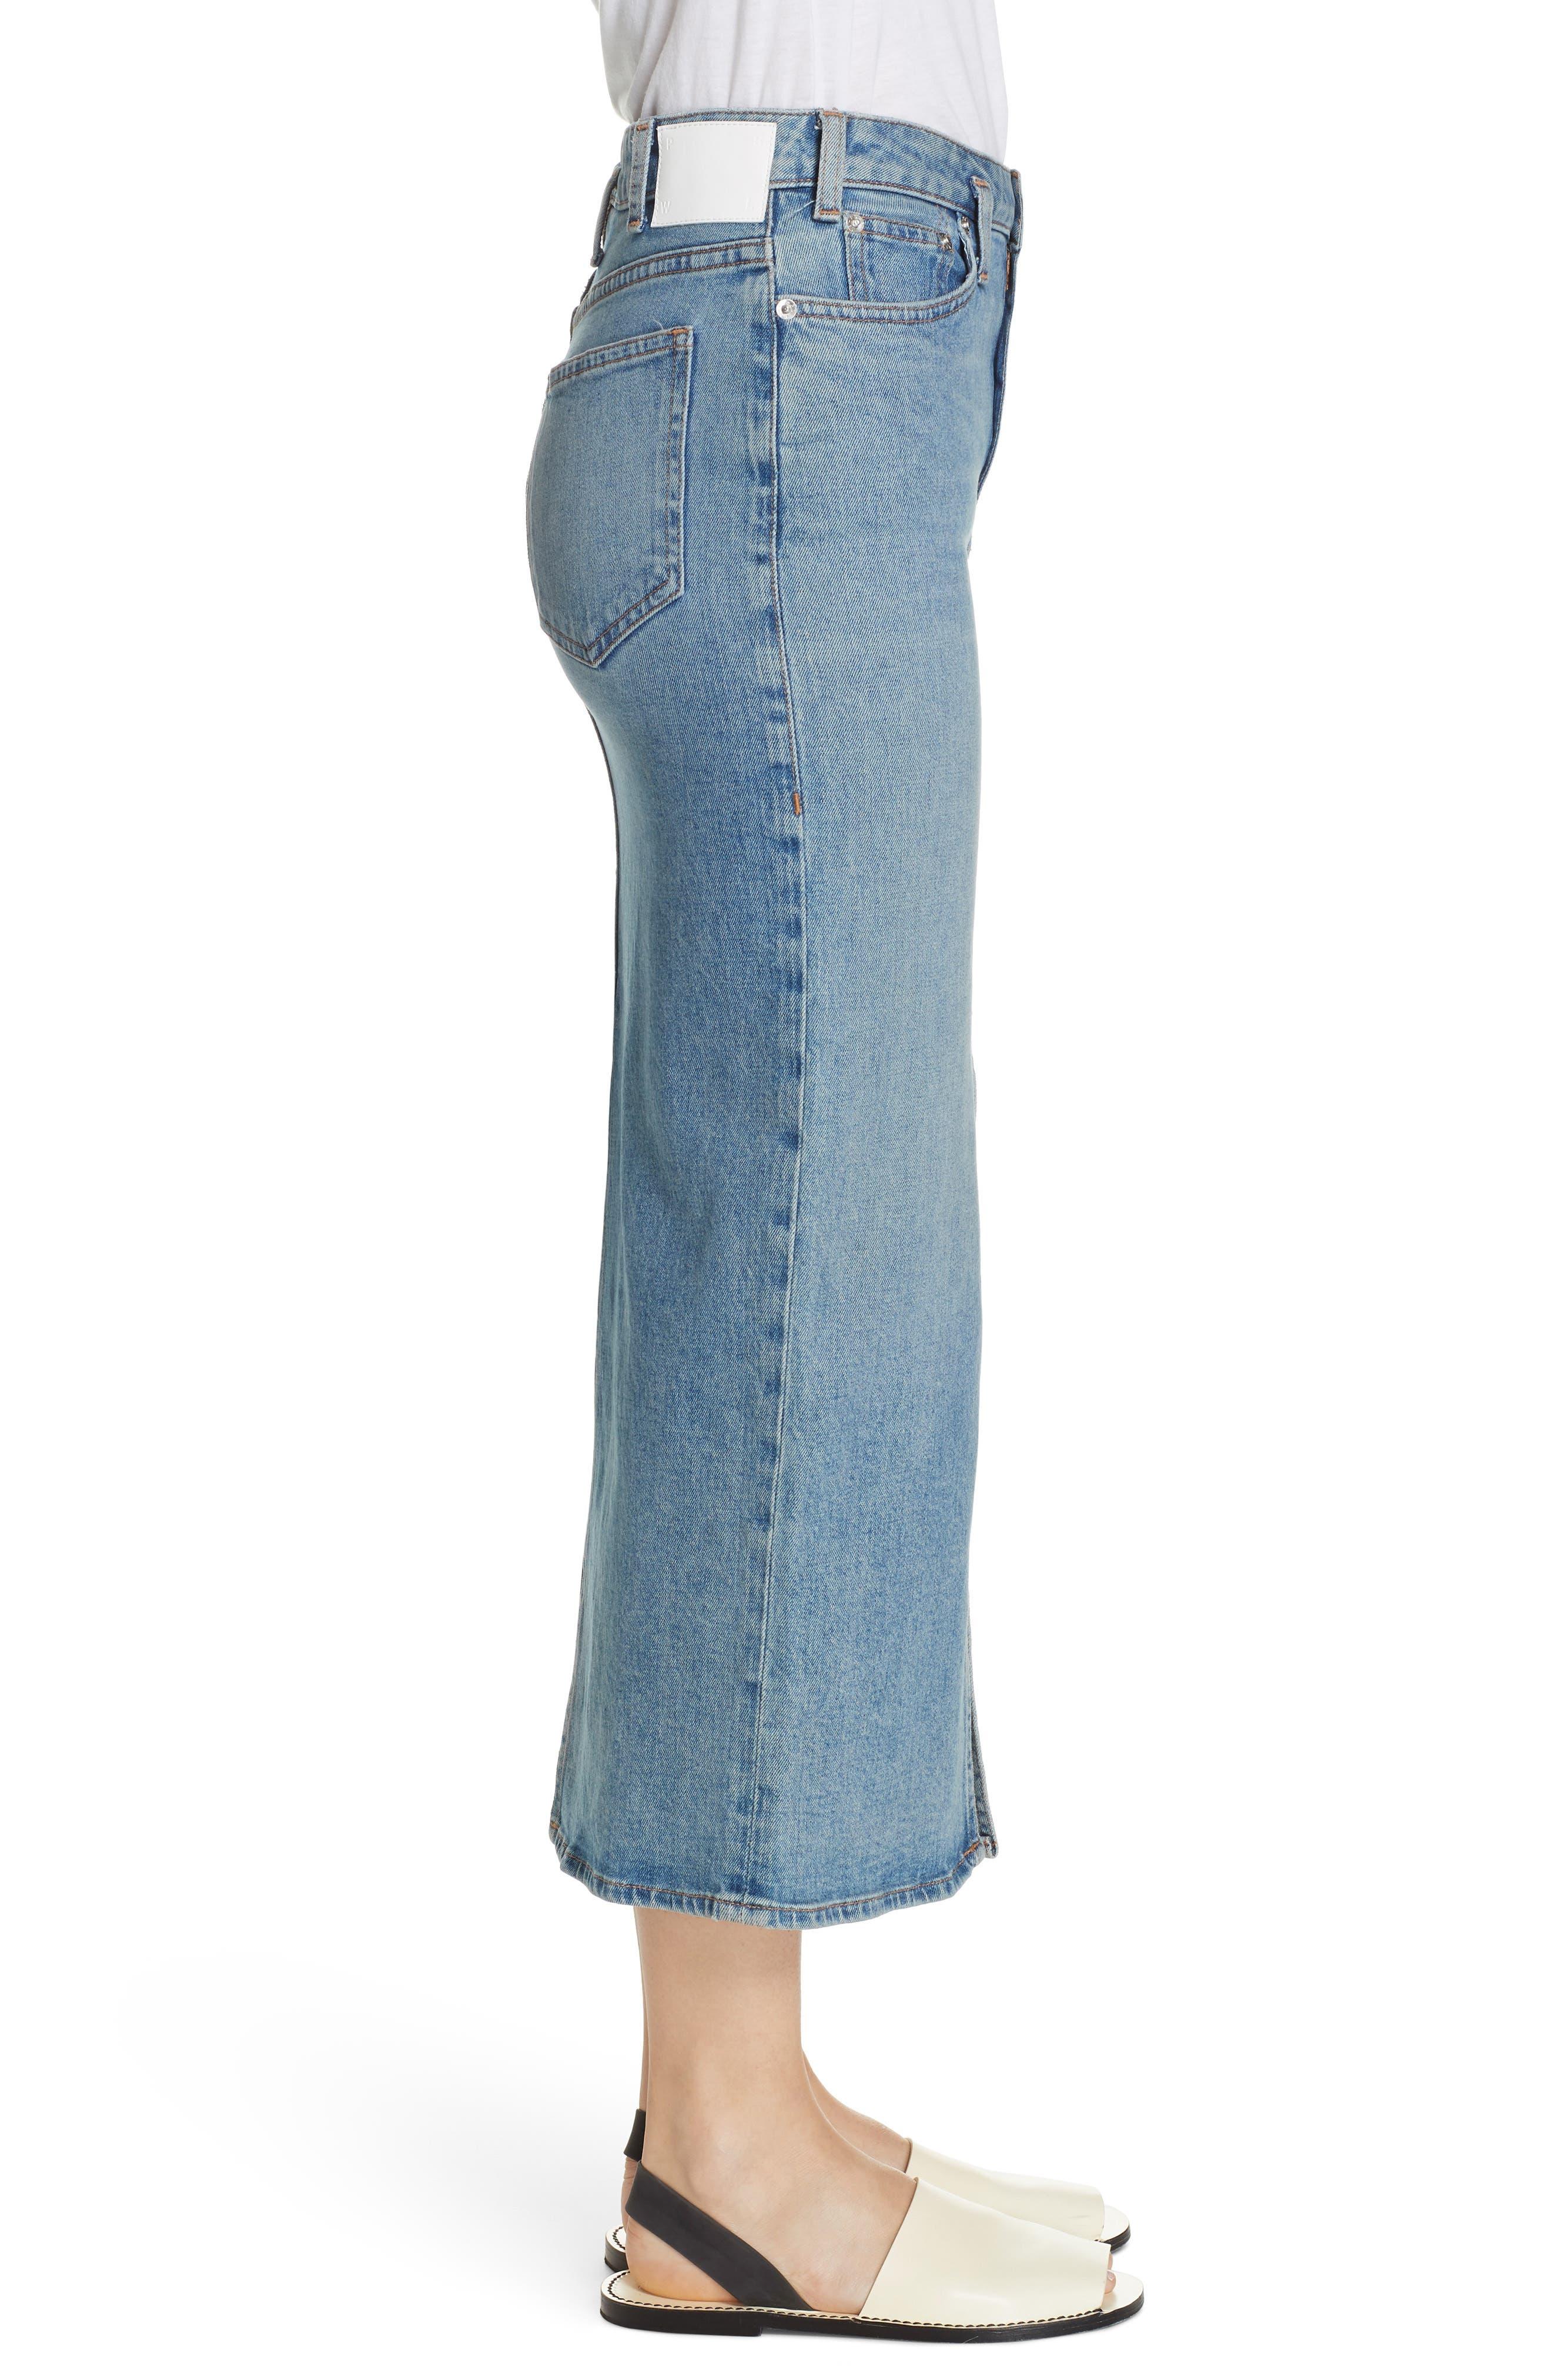 PROENZA SCHOULER, Slit Seam Denim Midi Skirt, Alternate thumbnail 3, color, CALIFORNIA